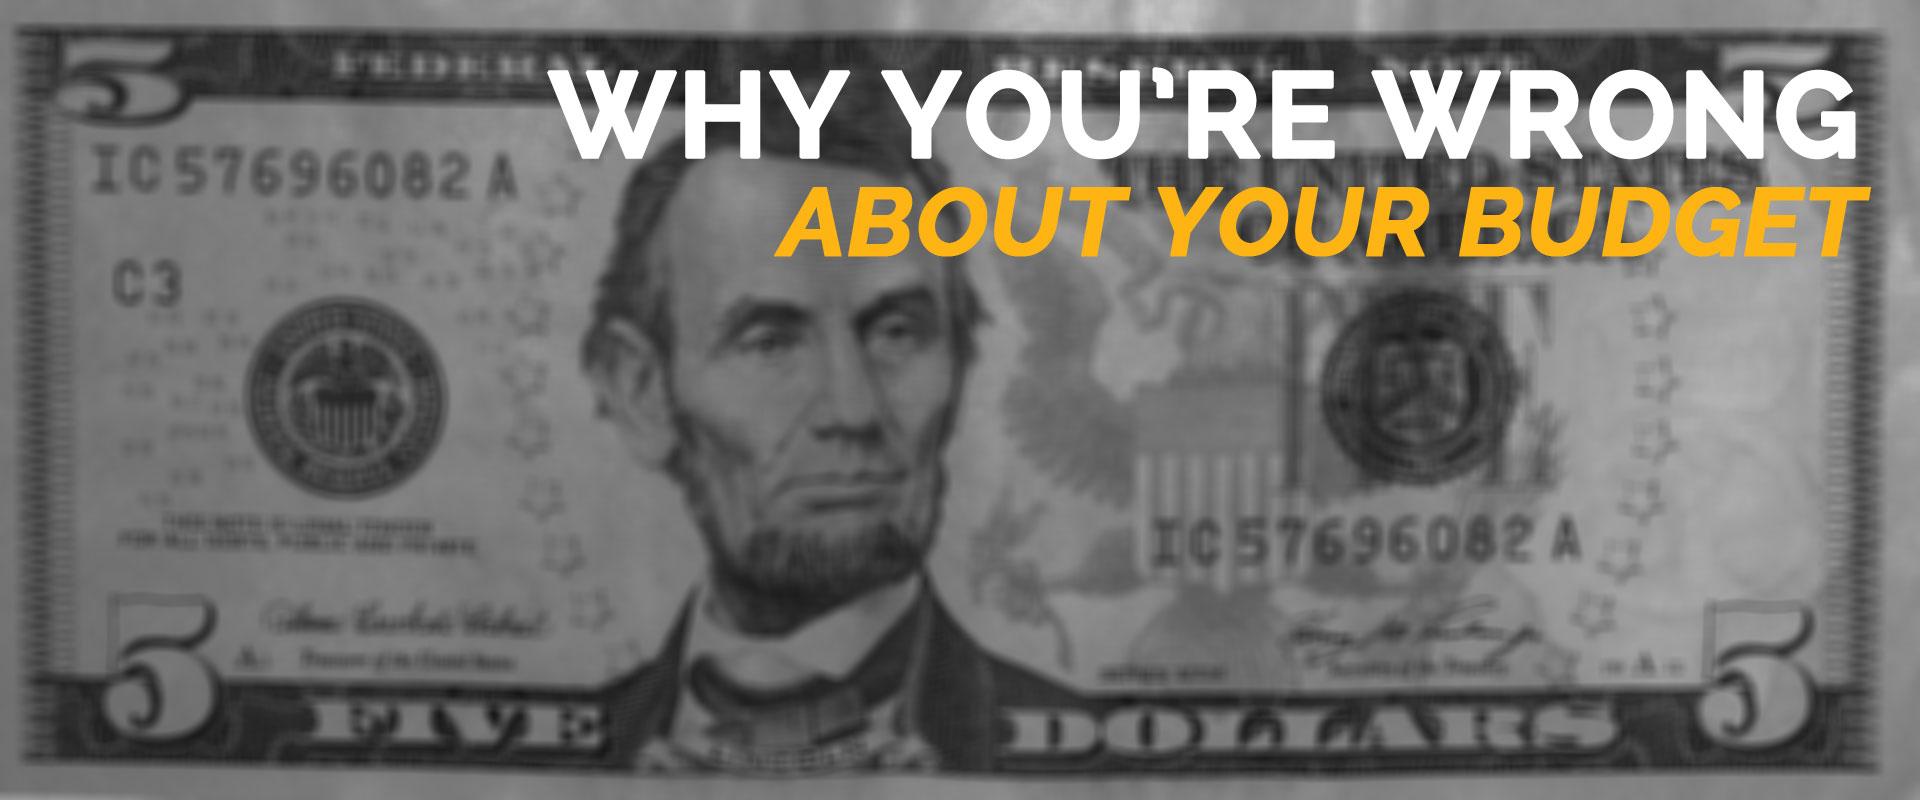 your website budget